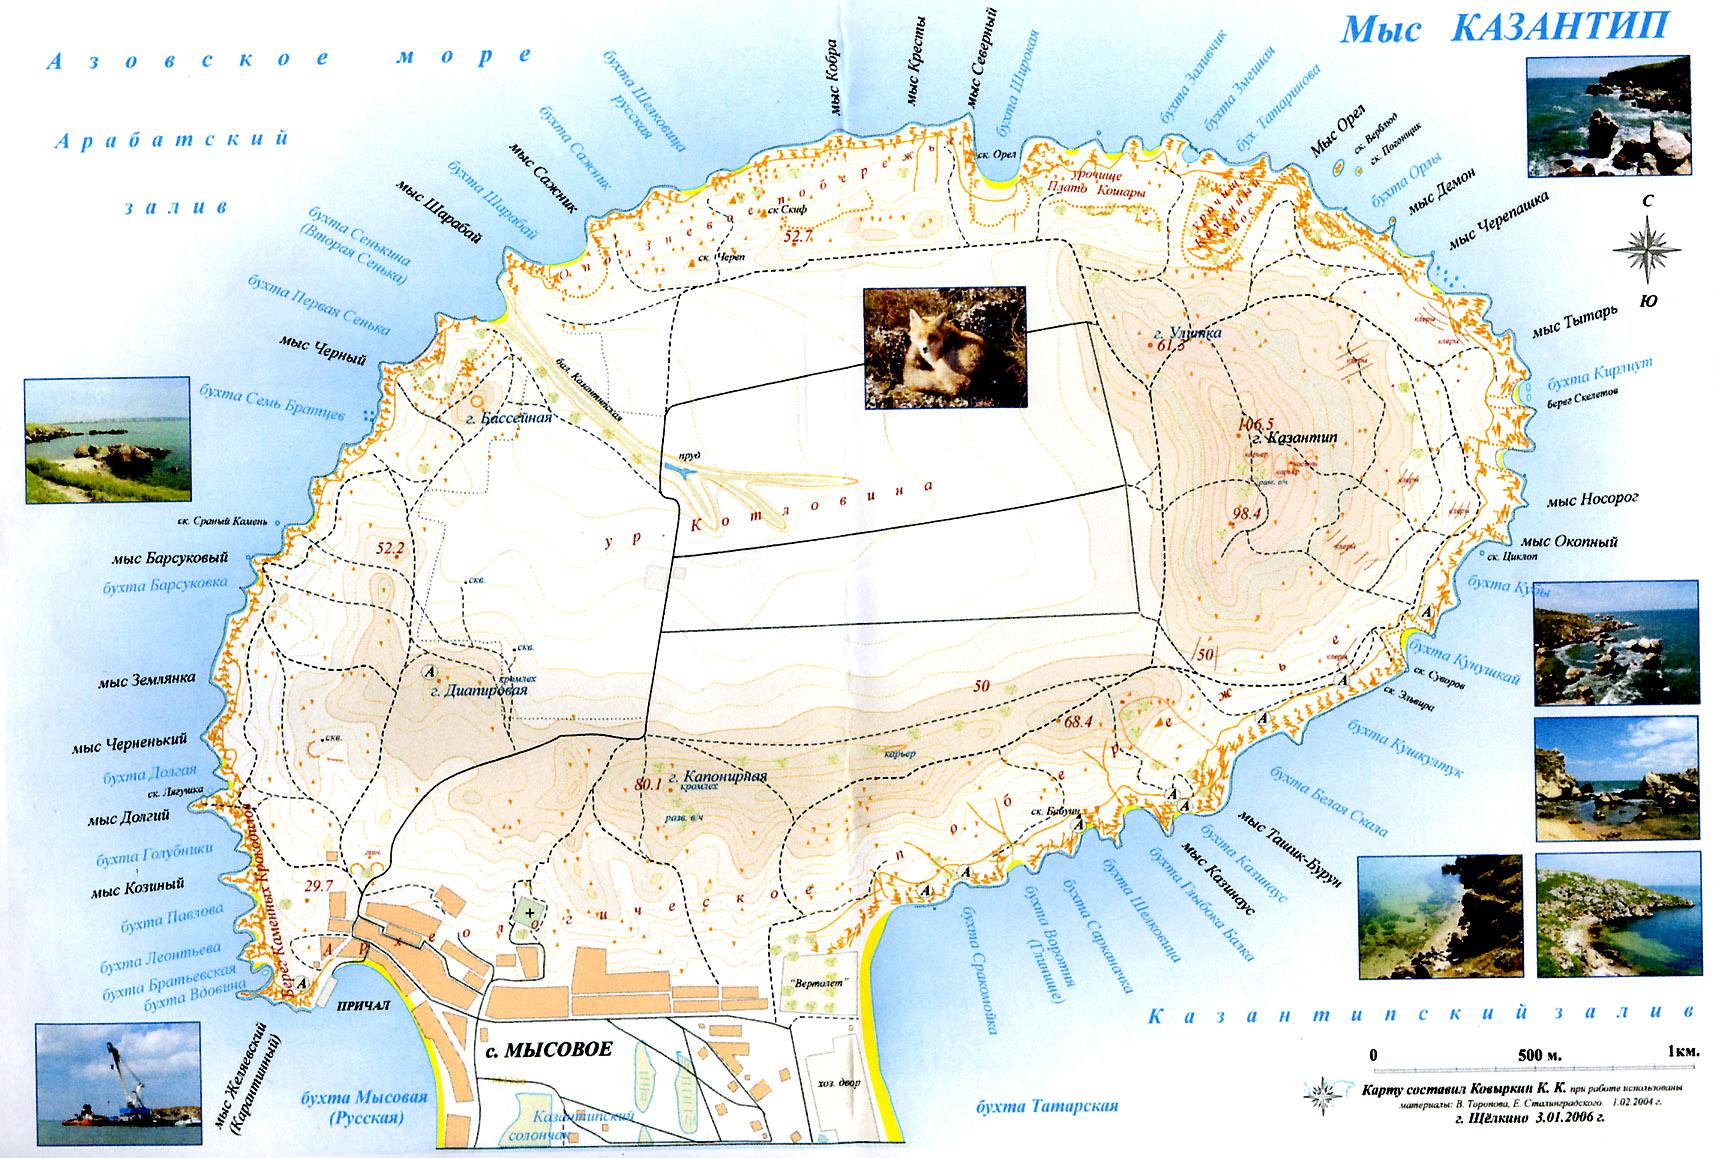 http://www.peterseldon.ru/travel/crimea2010/part1/images/kazantip-map-big.jpg